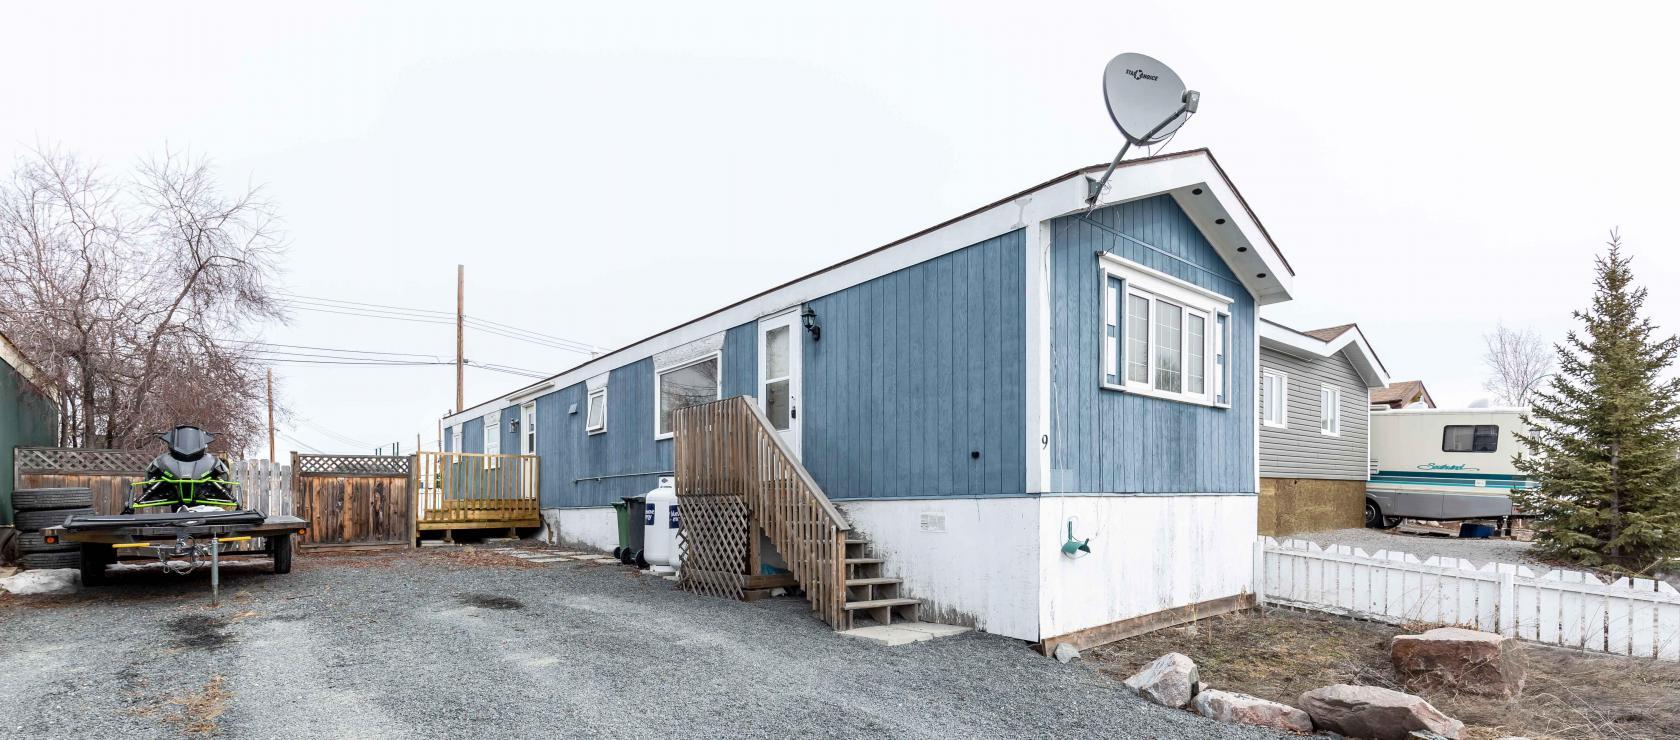 9 Hordal Road, Frame Lake, Yellowknife 2